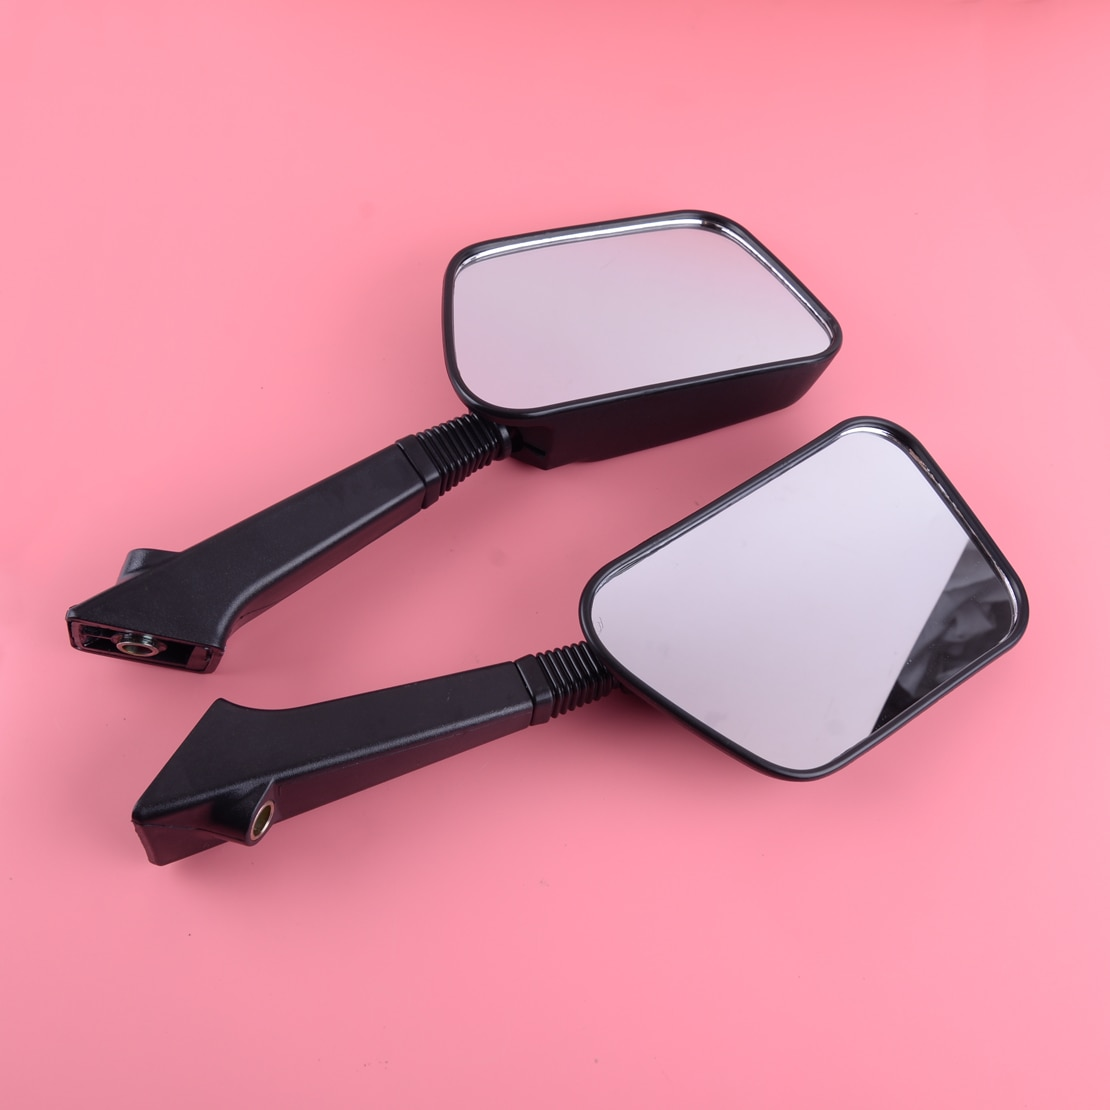 DWCX 1 par de espejo retrovisor negro apto para Honda Elite CF80 Aero CH80 NH80 CH125 CH150 CH150D DELUXE